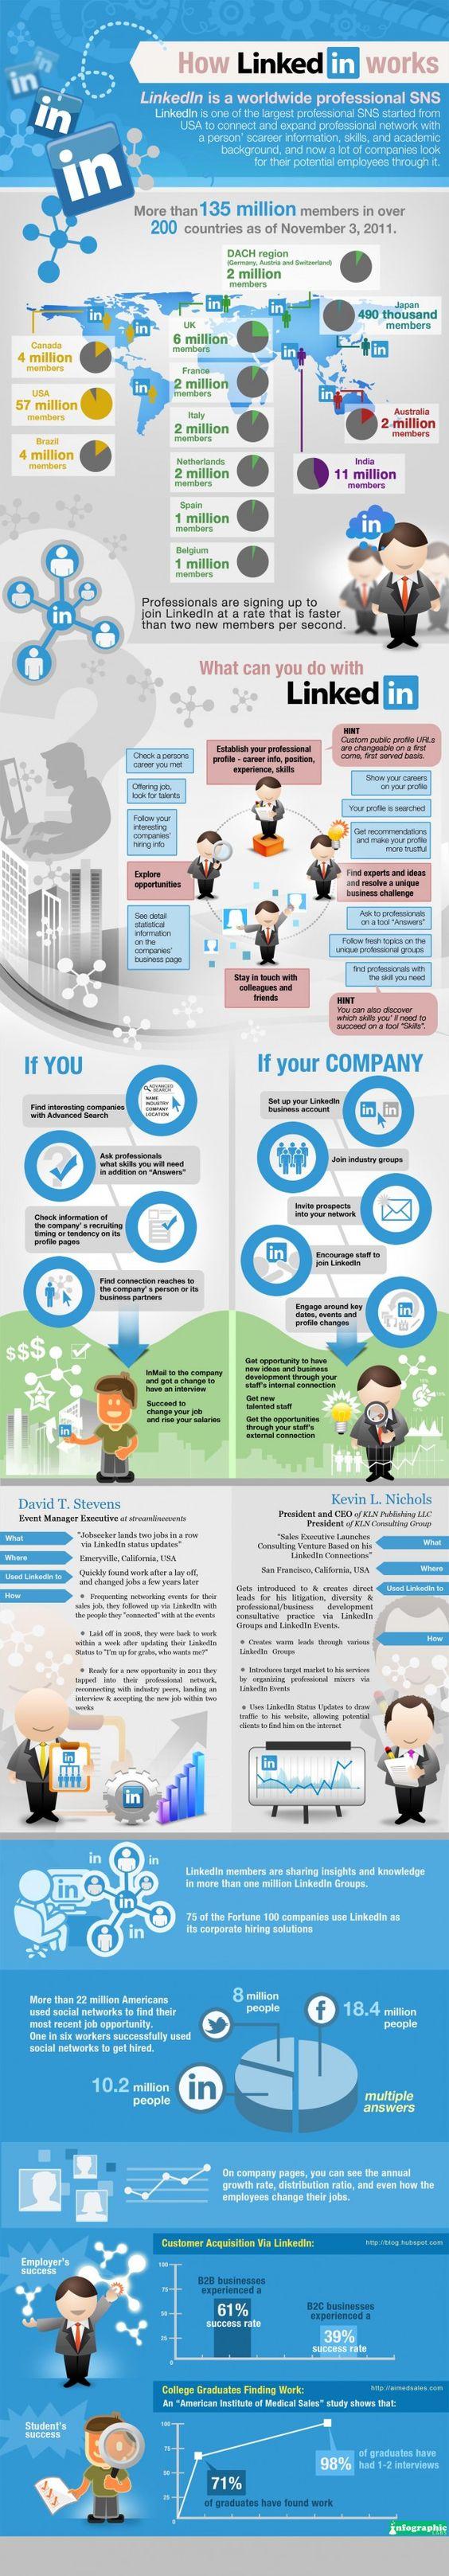 Infographic #LinkedIn